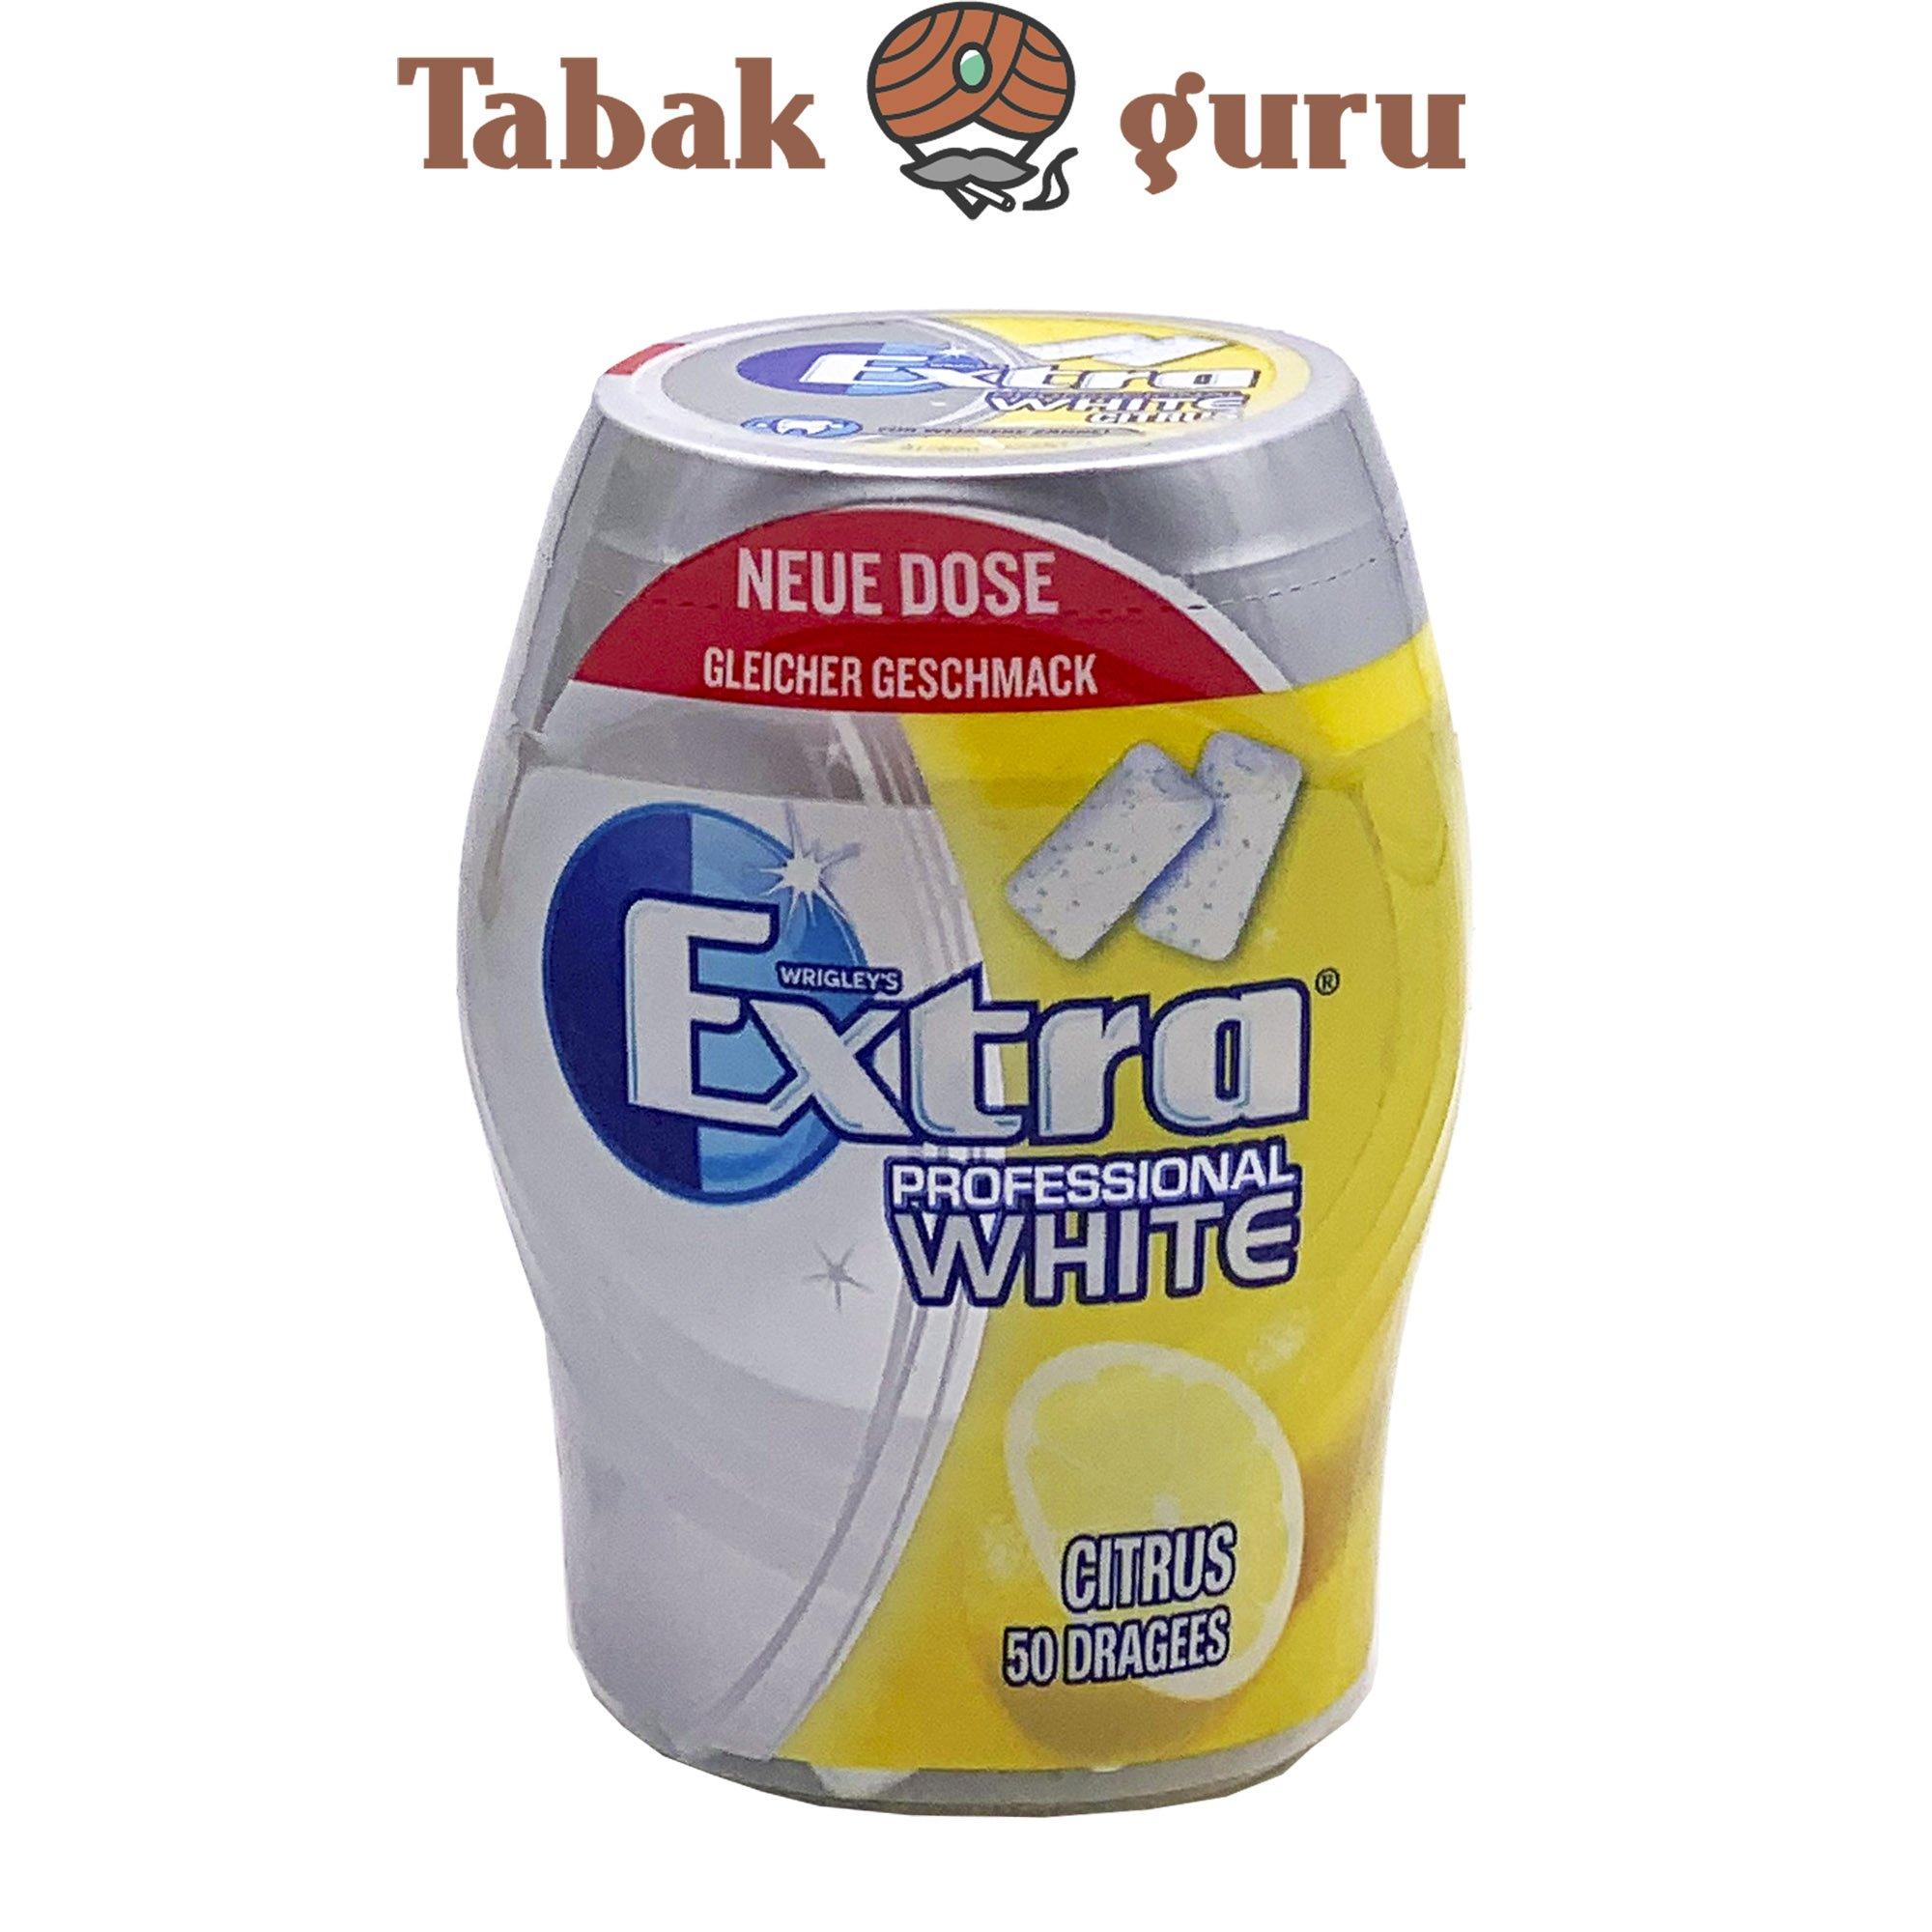 Wrigleys Extra Professional White Citrus Geschmack Inhalt 50 Dragees